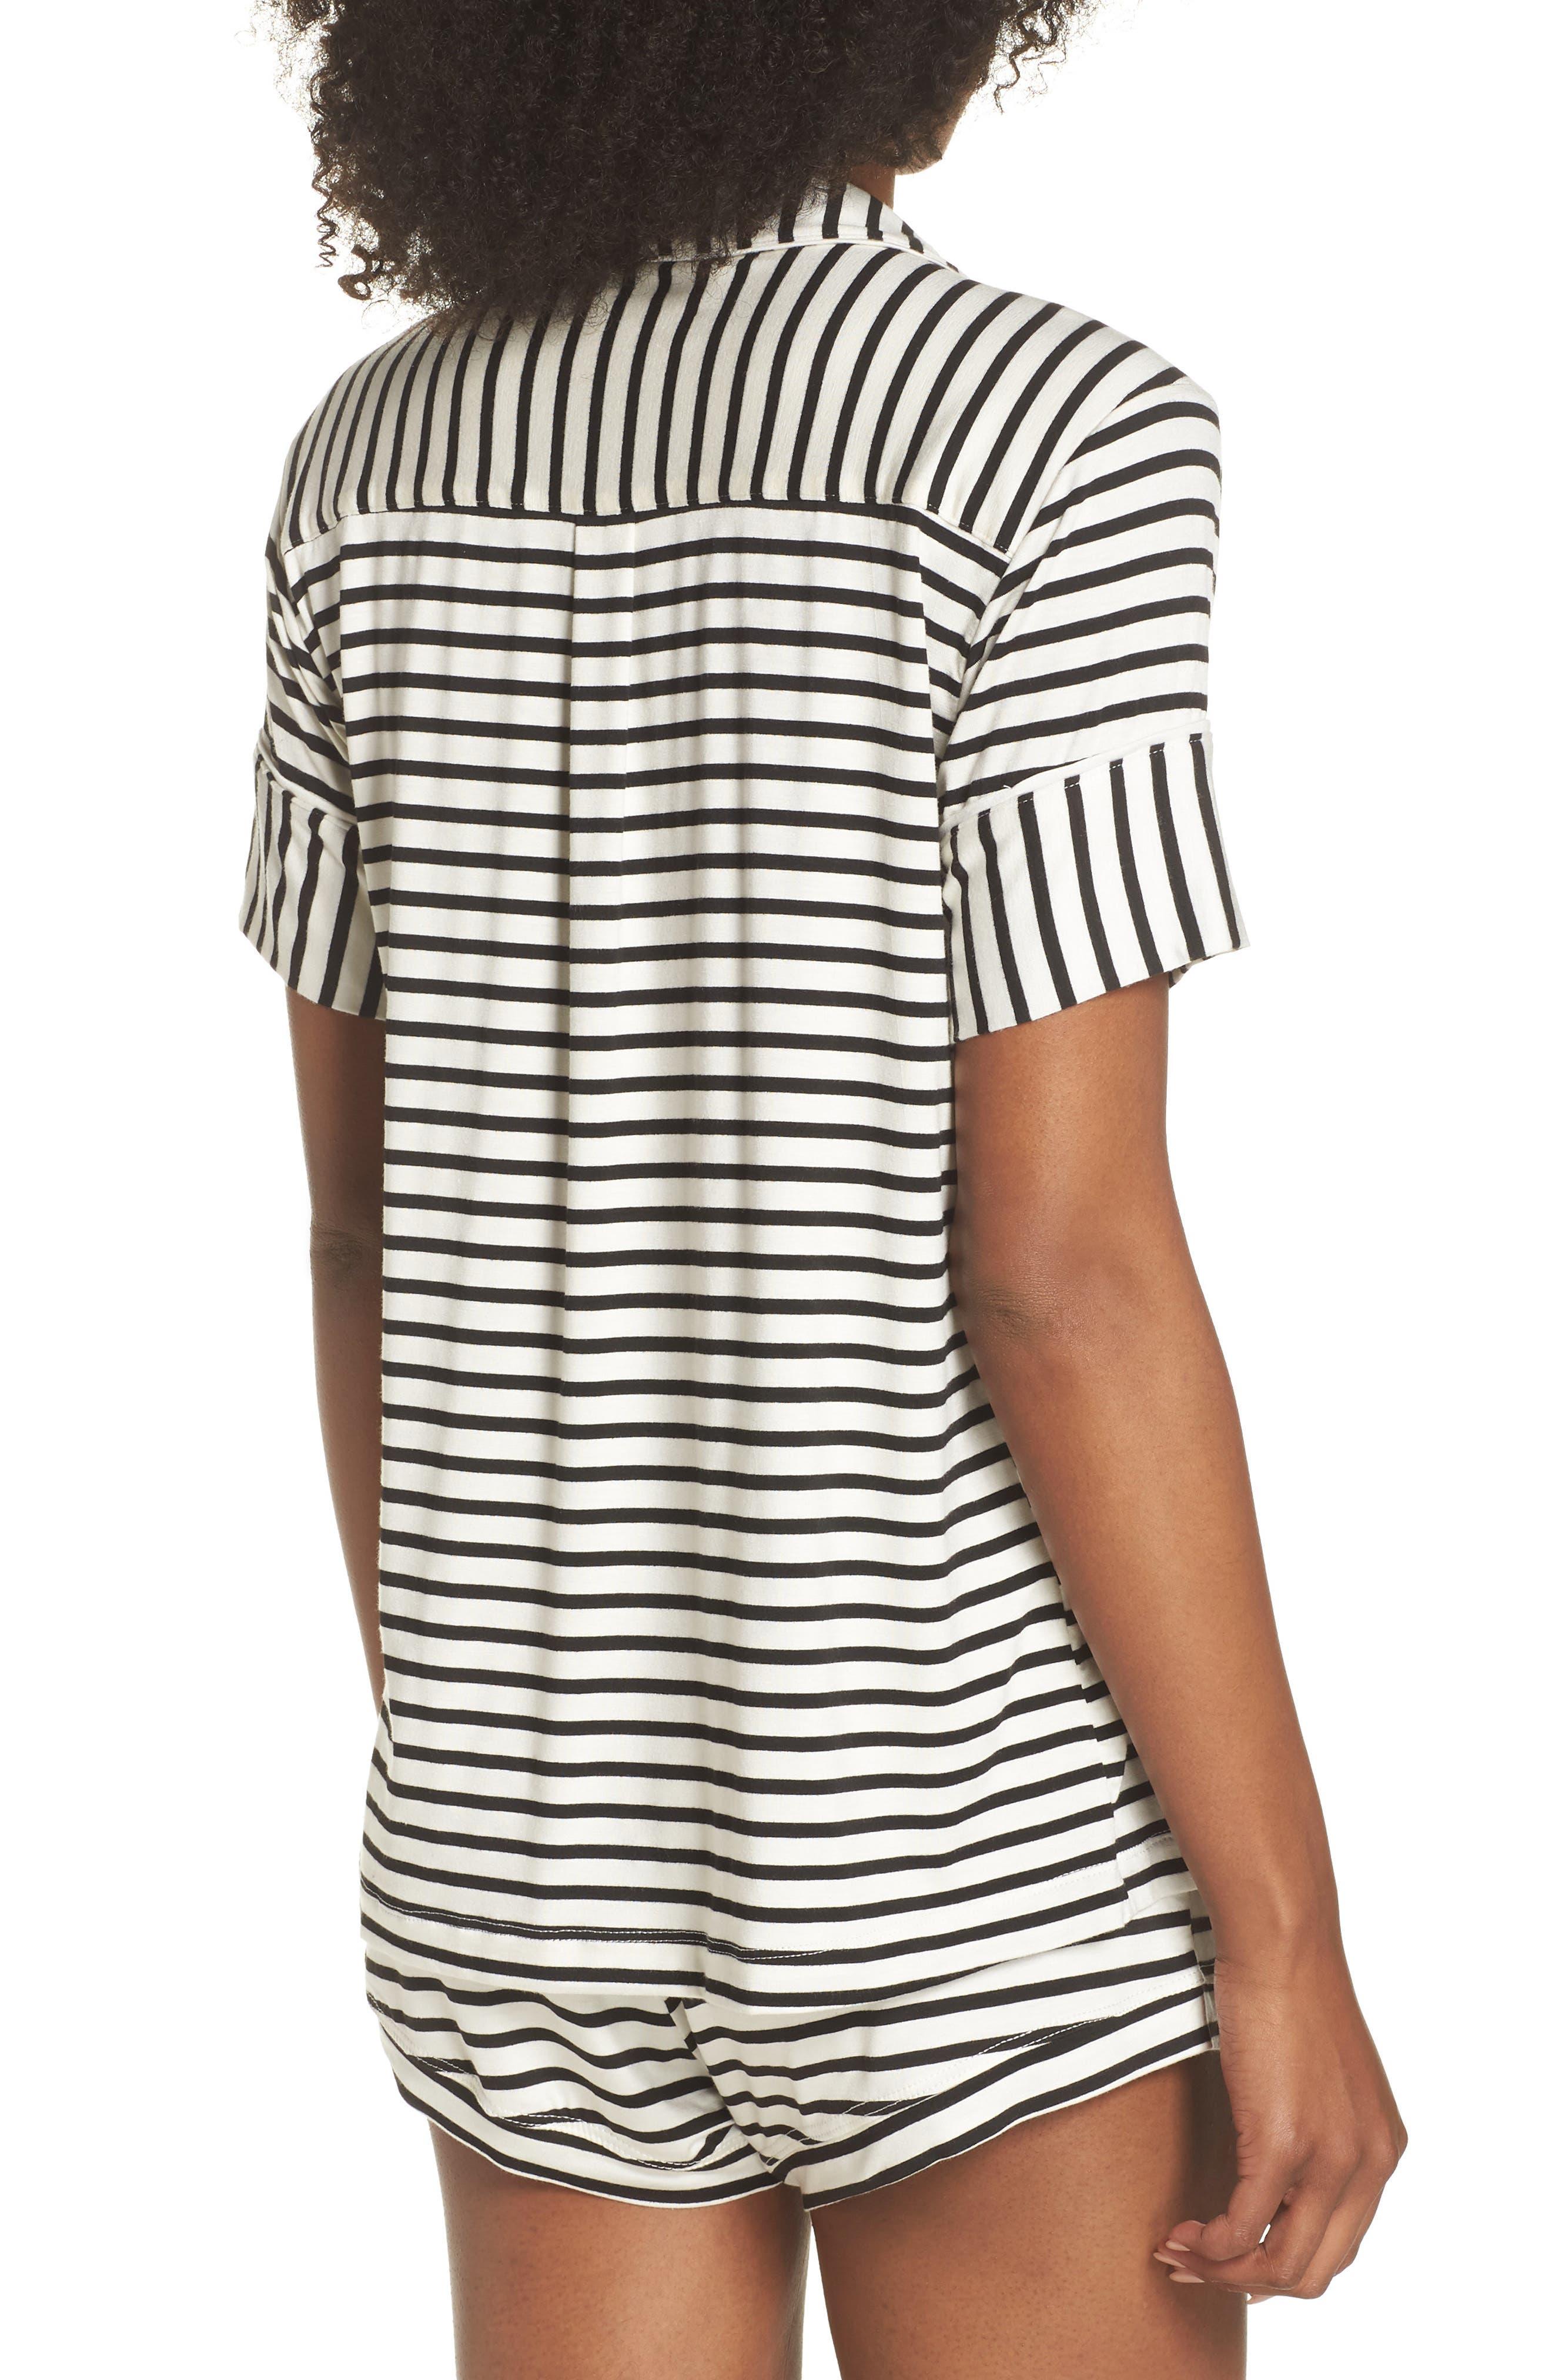 Monaco Short Pajamas,                             Alternate thumbnail 2, color,                             Pearl Stripe